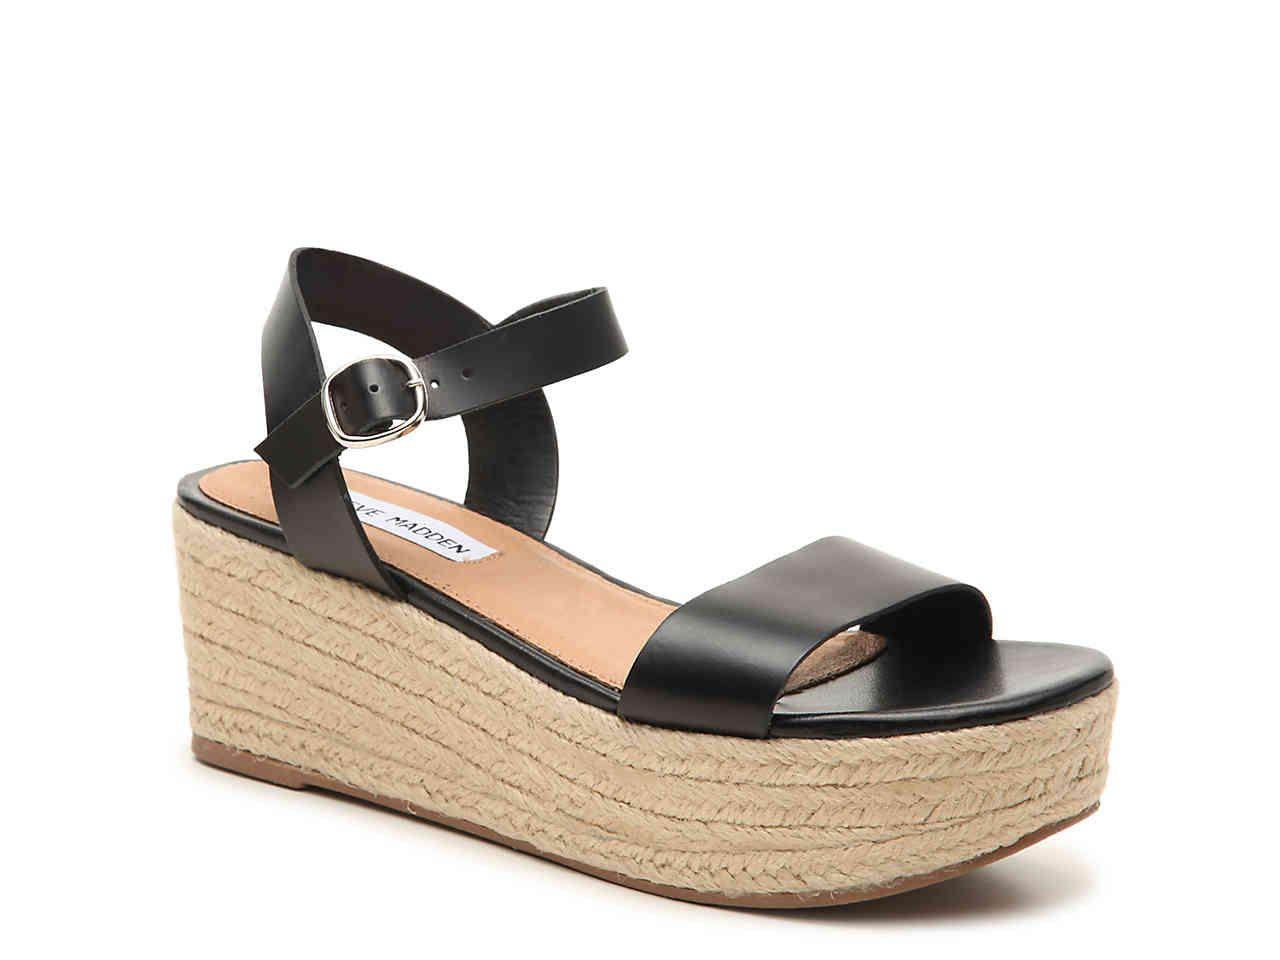 658dc5a6c09 Steve Madden Brandice Espadrille Wedge Sandal Women's Shoes | DSW ...